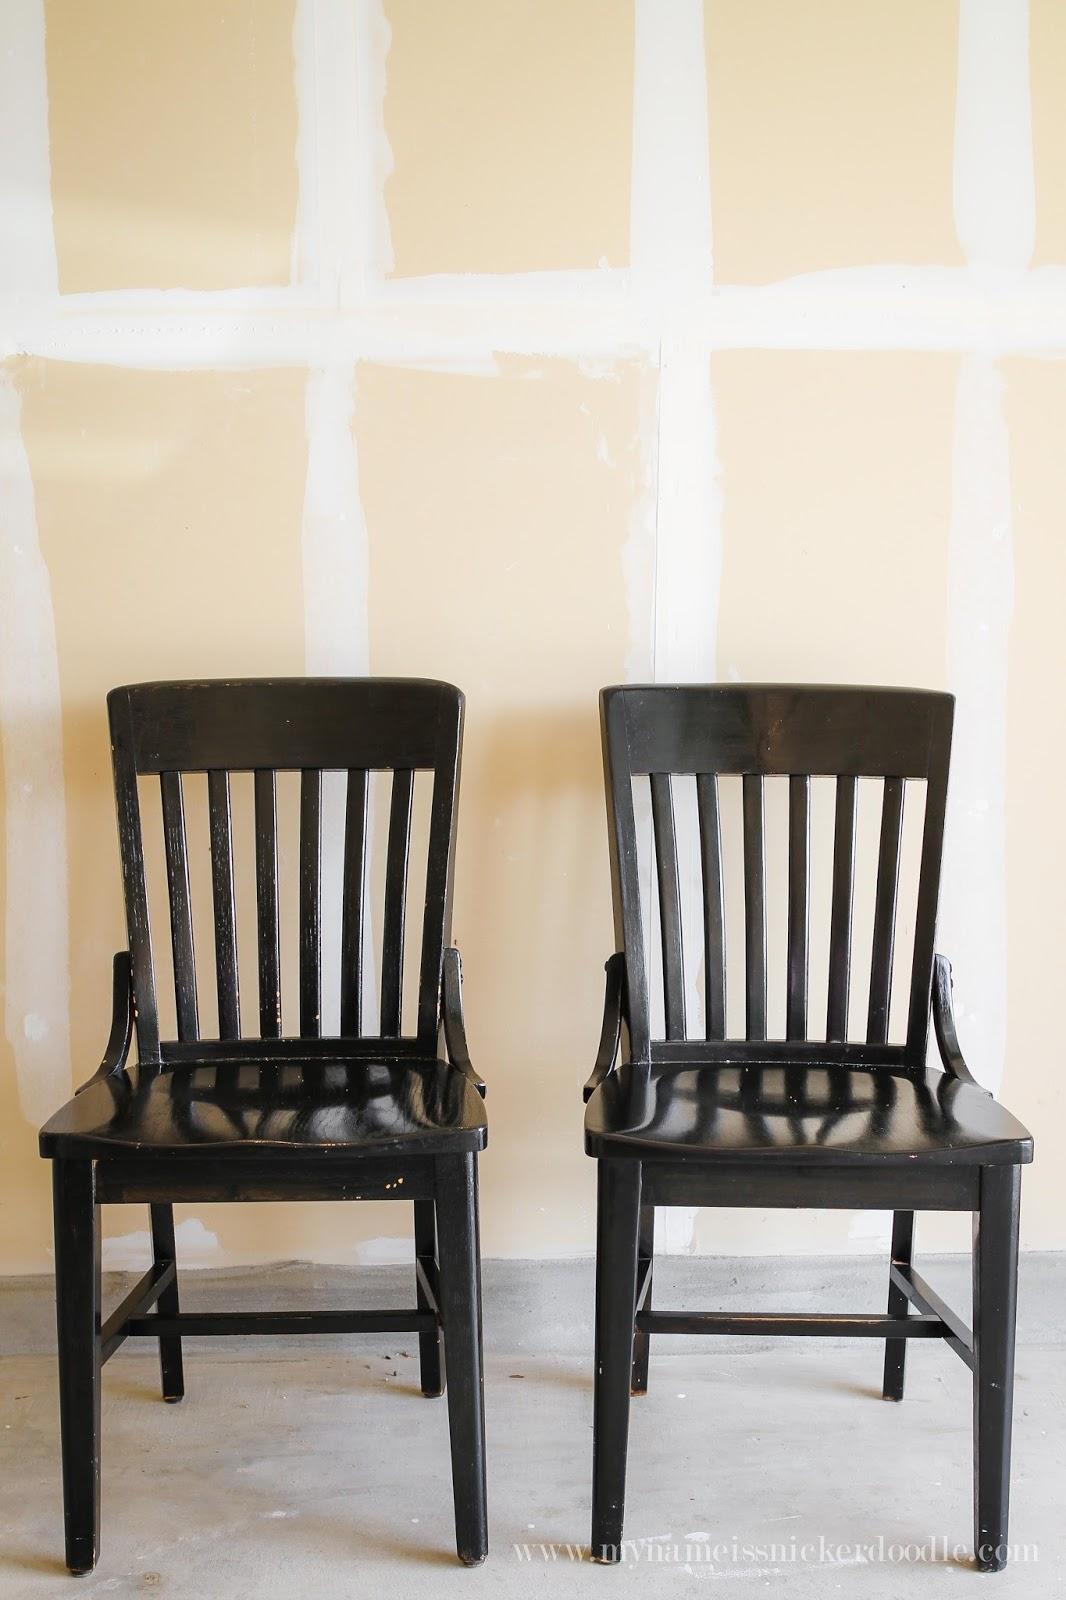 Chalk paint kitchen chairs - Brighten And Lighten Up Dark Kitchen Chairs With Chalk Paint Mynameissnickerdoodle Com